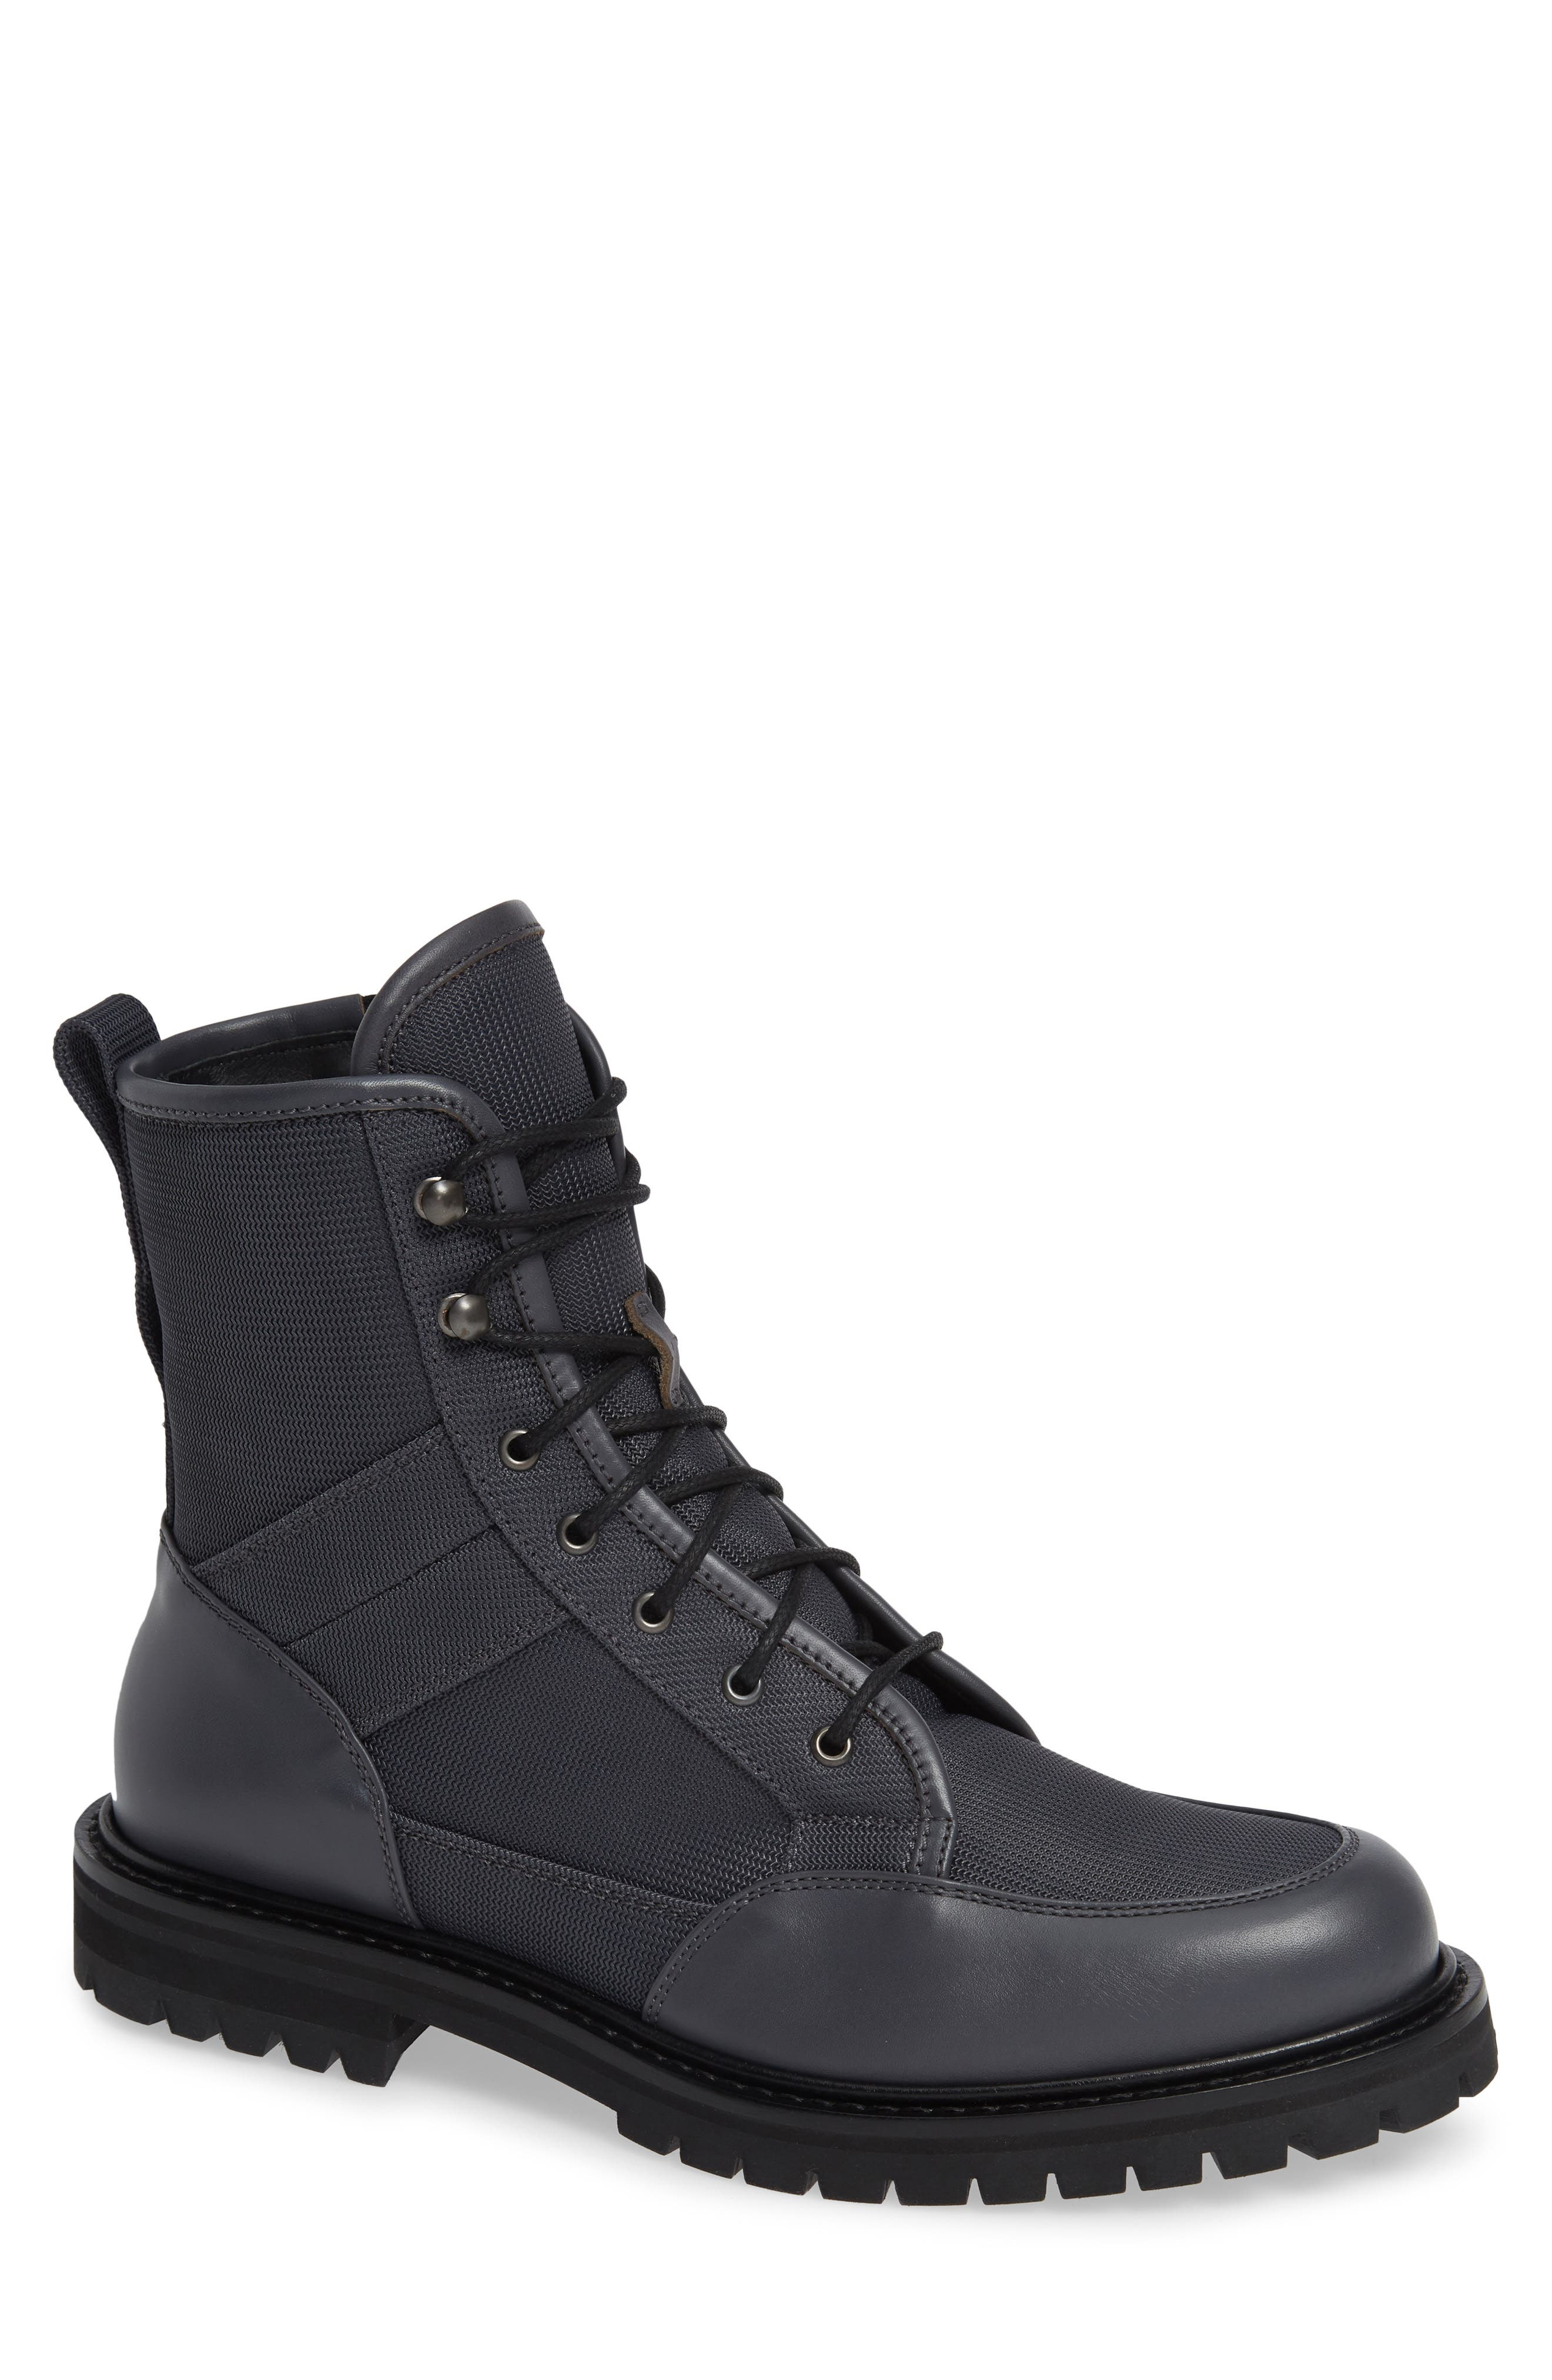 Aquatalia Irus Weatherproof Mesh Boot, Grey